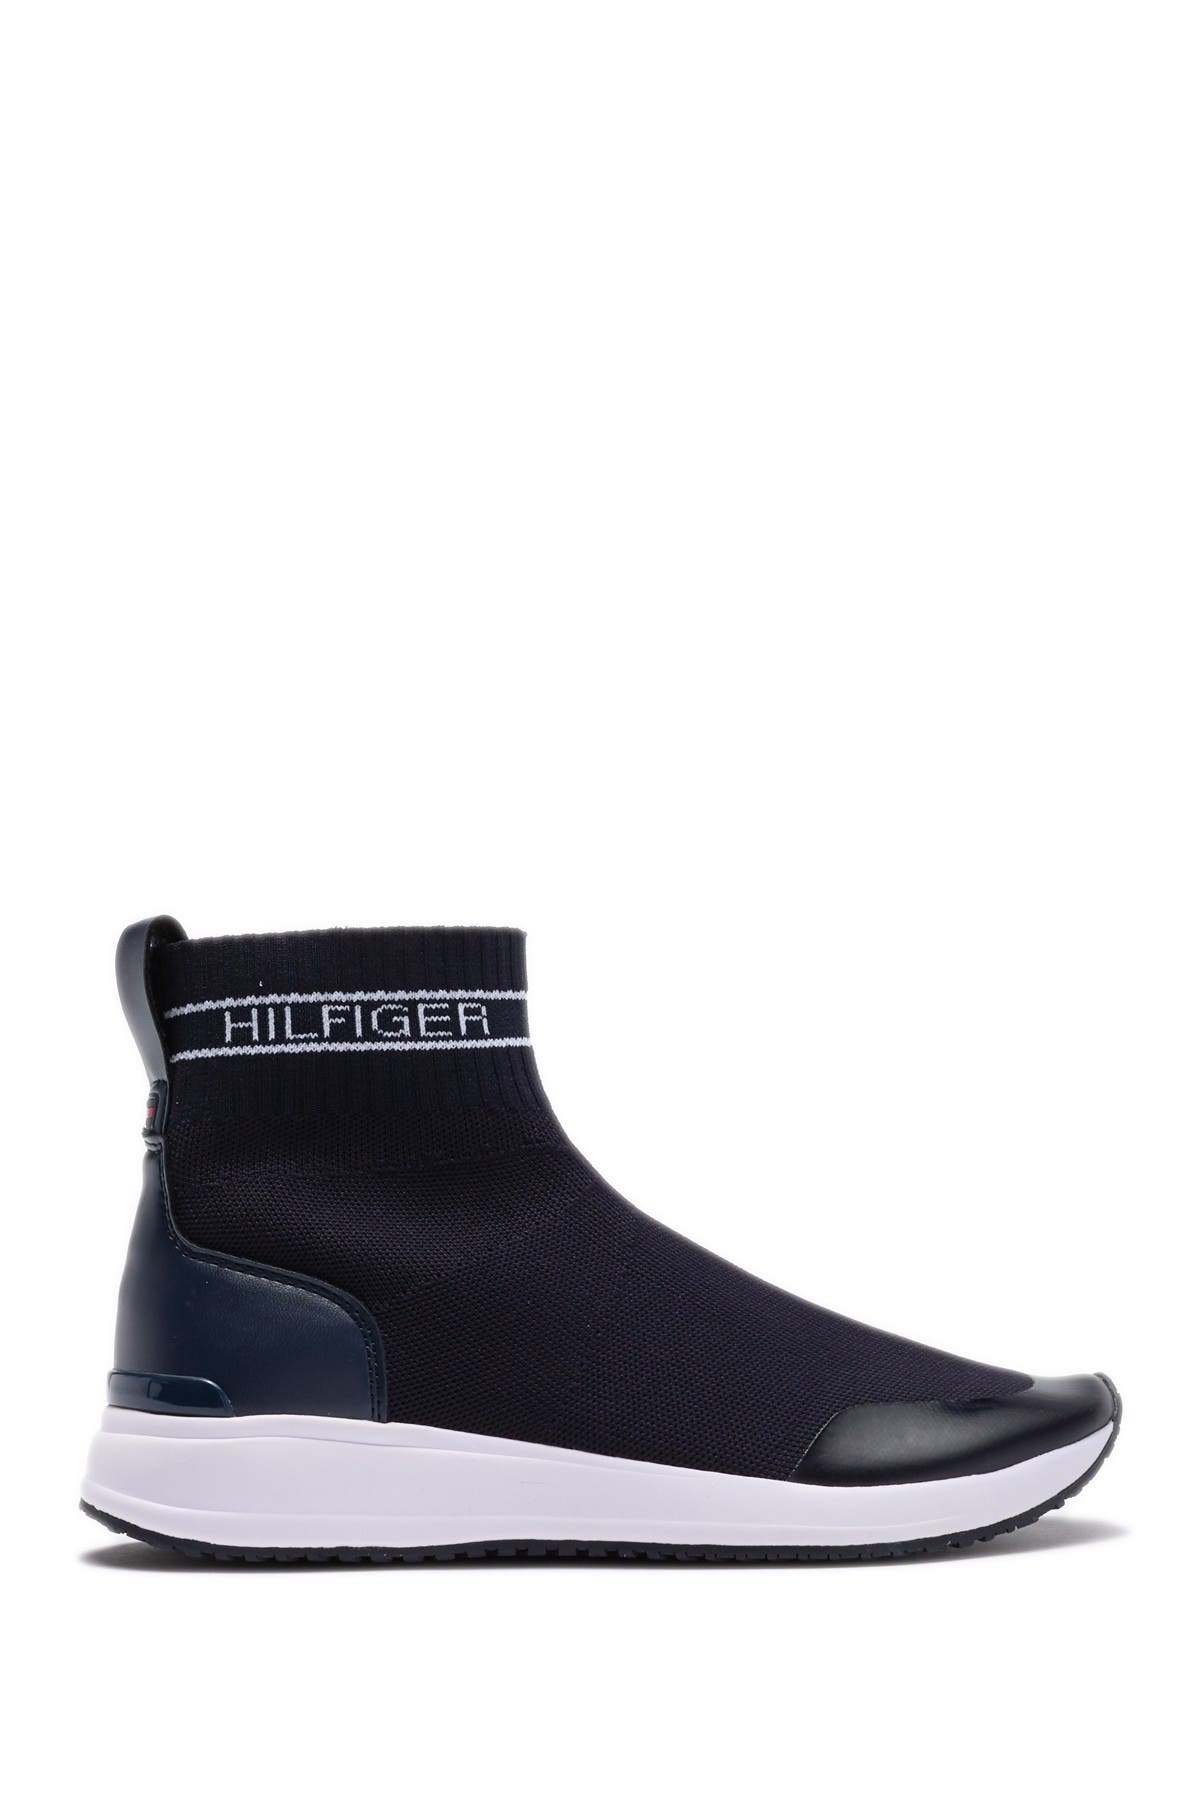 Tommy Hilfiger   Reco Sock Sneaker